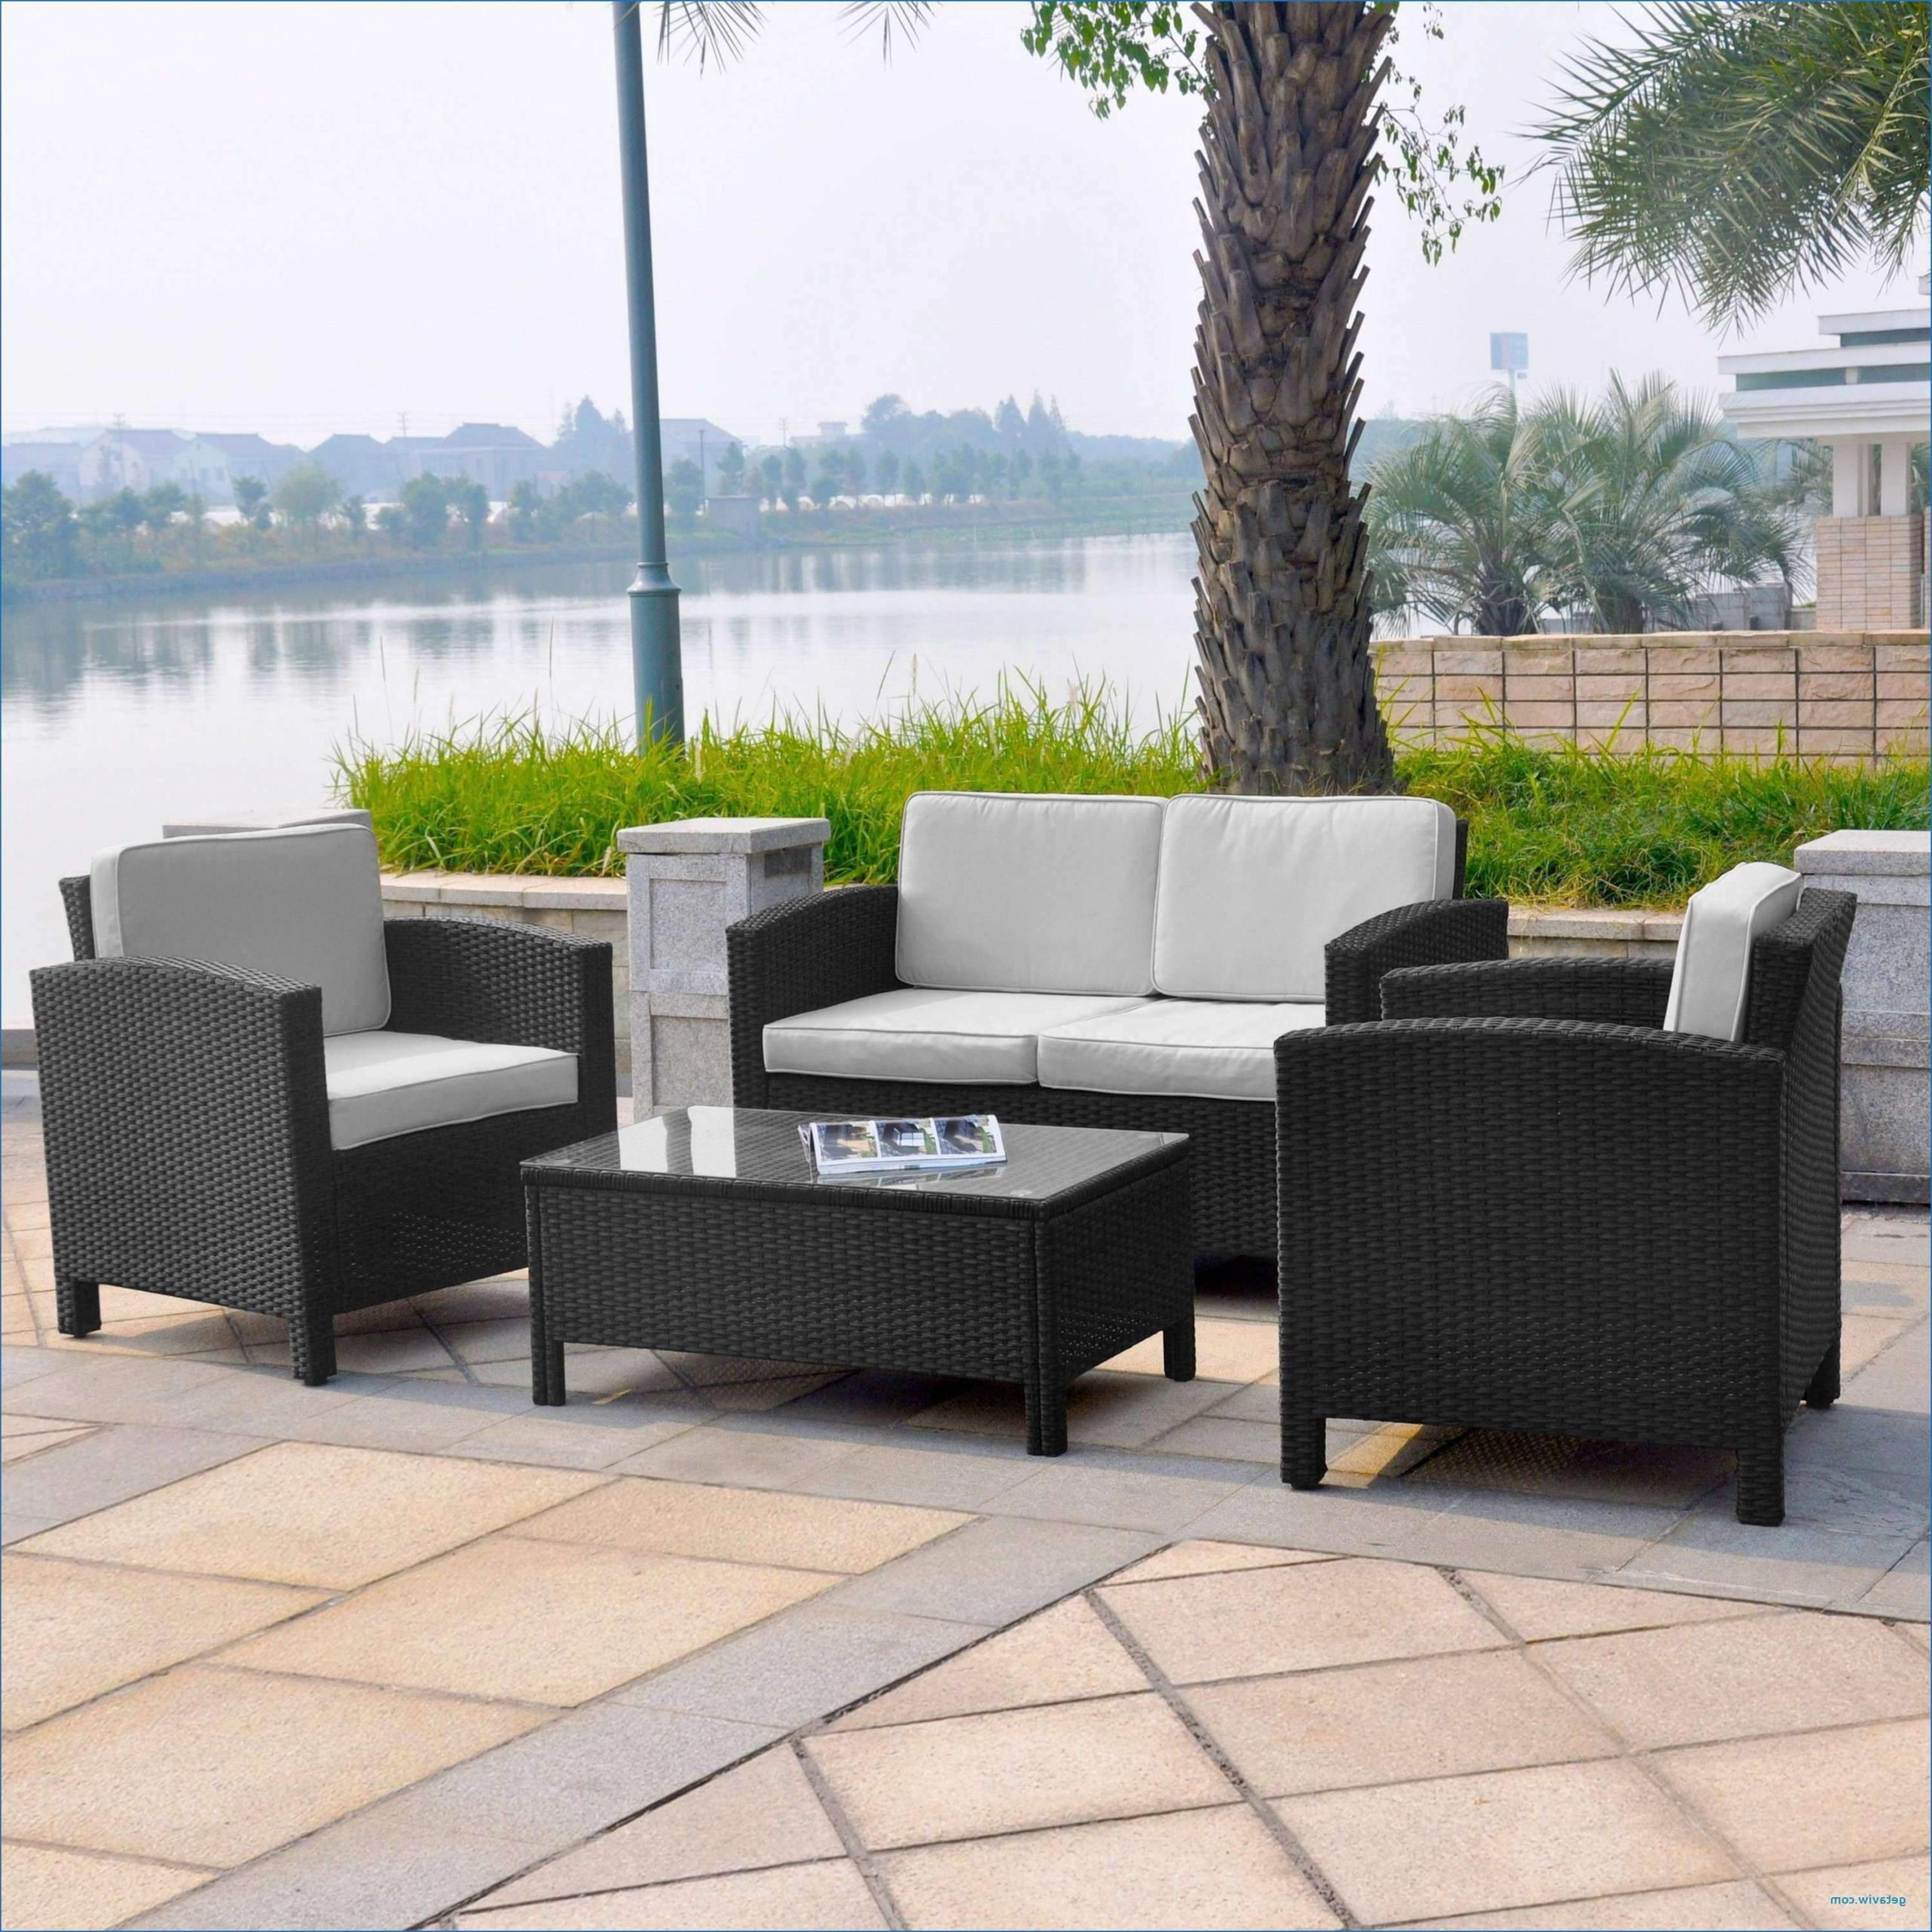 gartenmobel lounge set aluminium gartenmobel lounge sessel c3hwegpz of kleine sessel gunstig